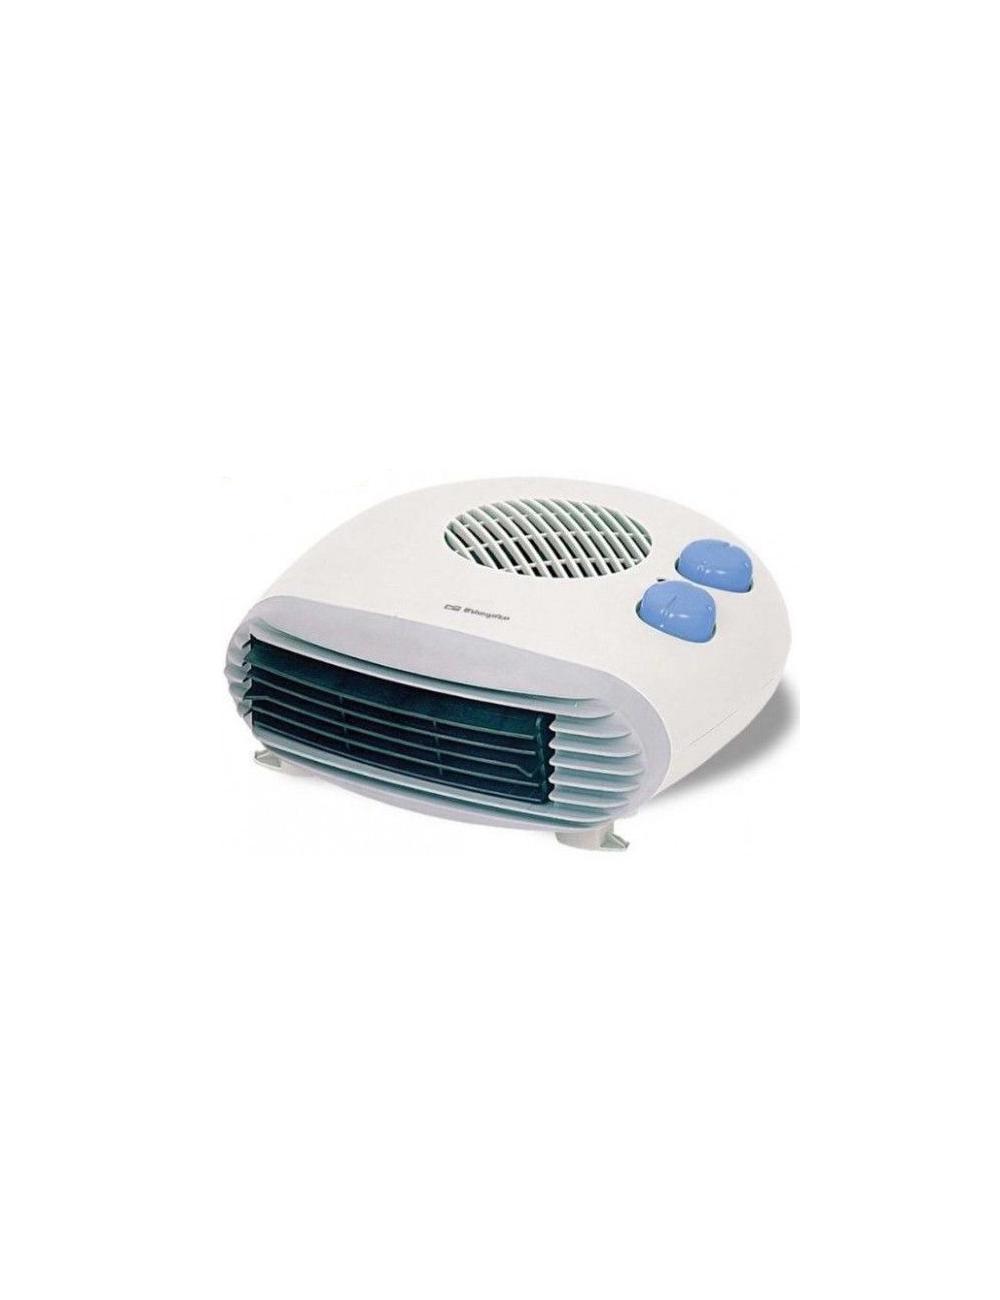 Orbegozo calefactor FH 5009 2000 W